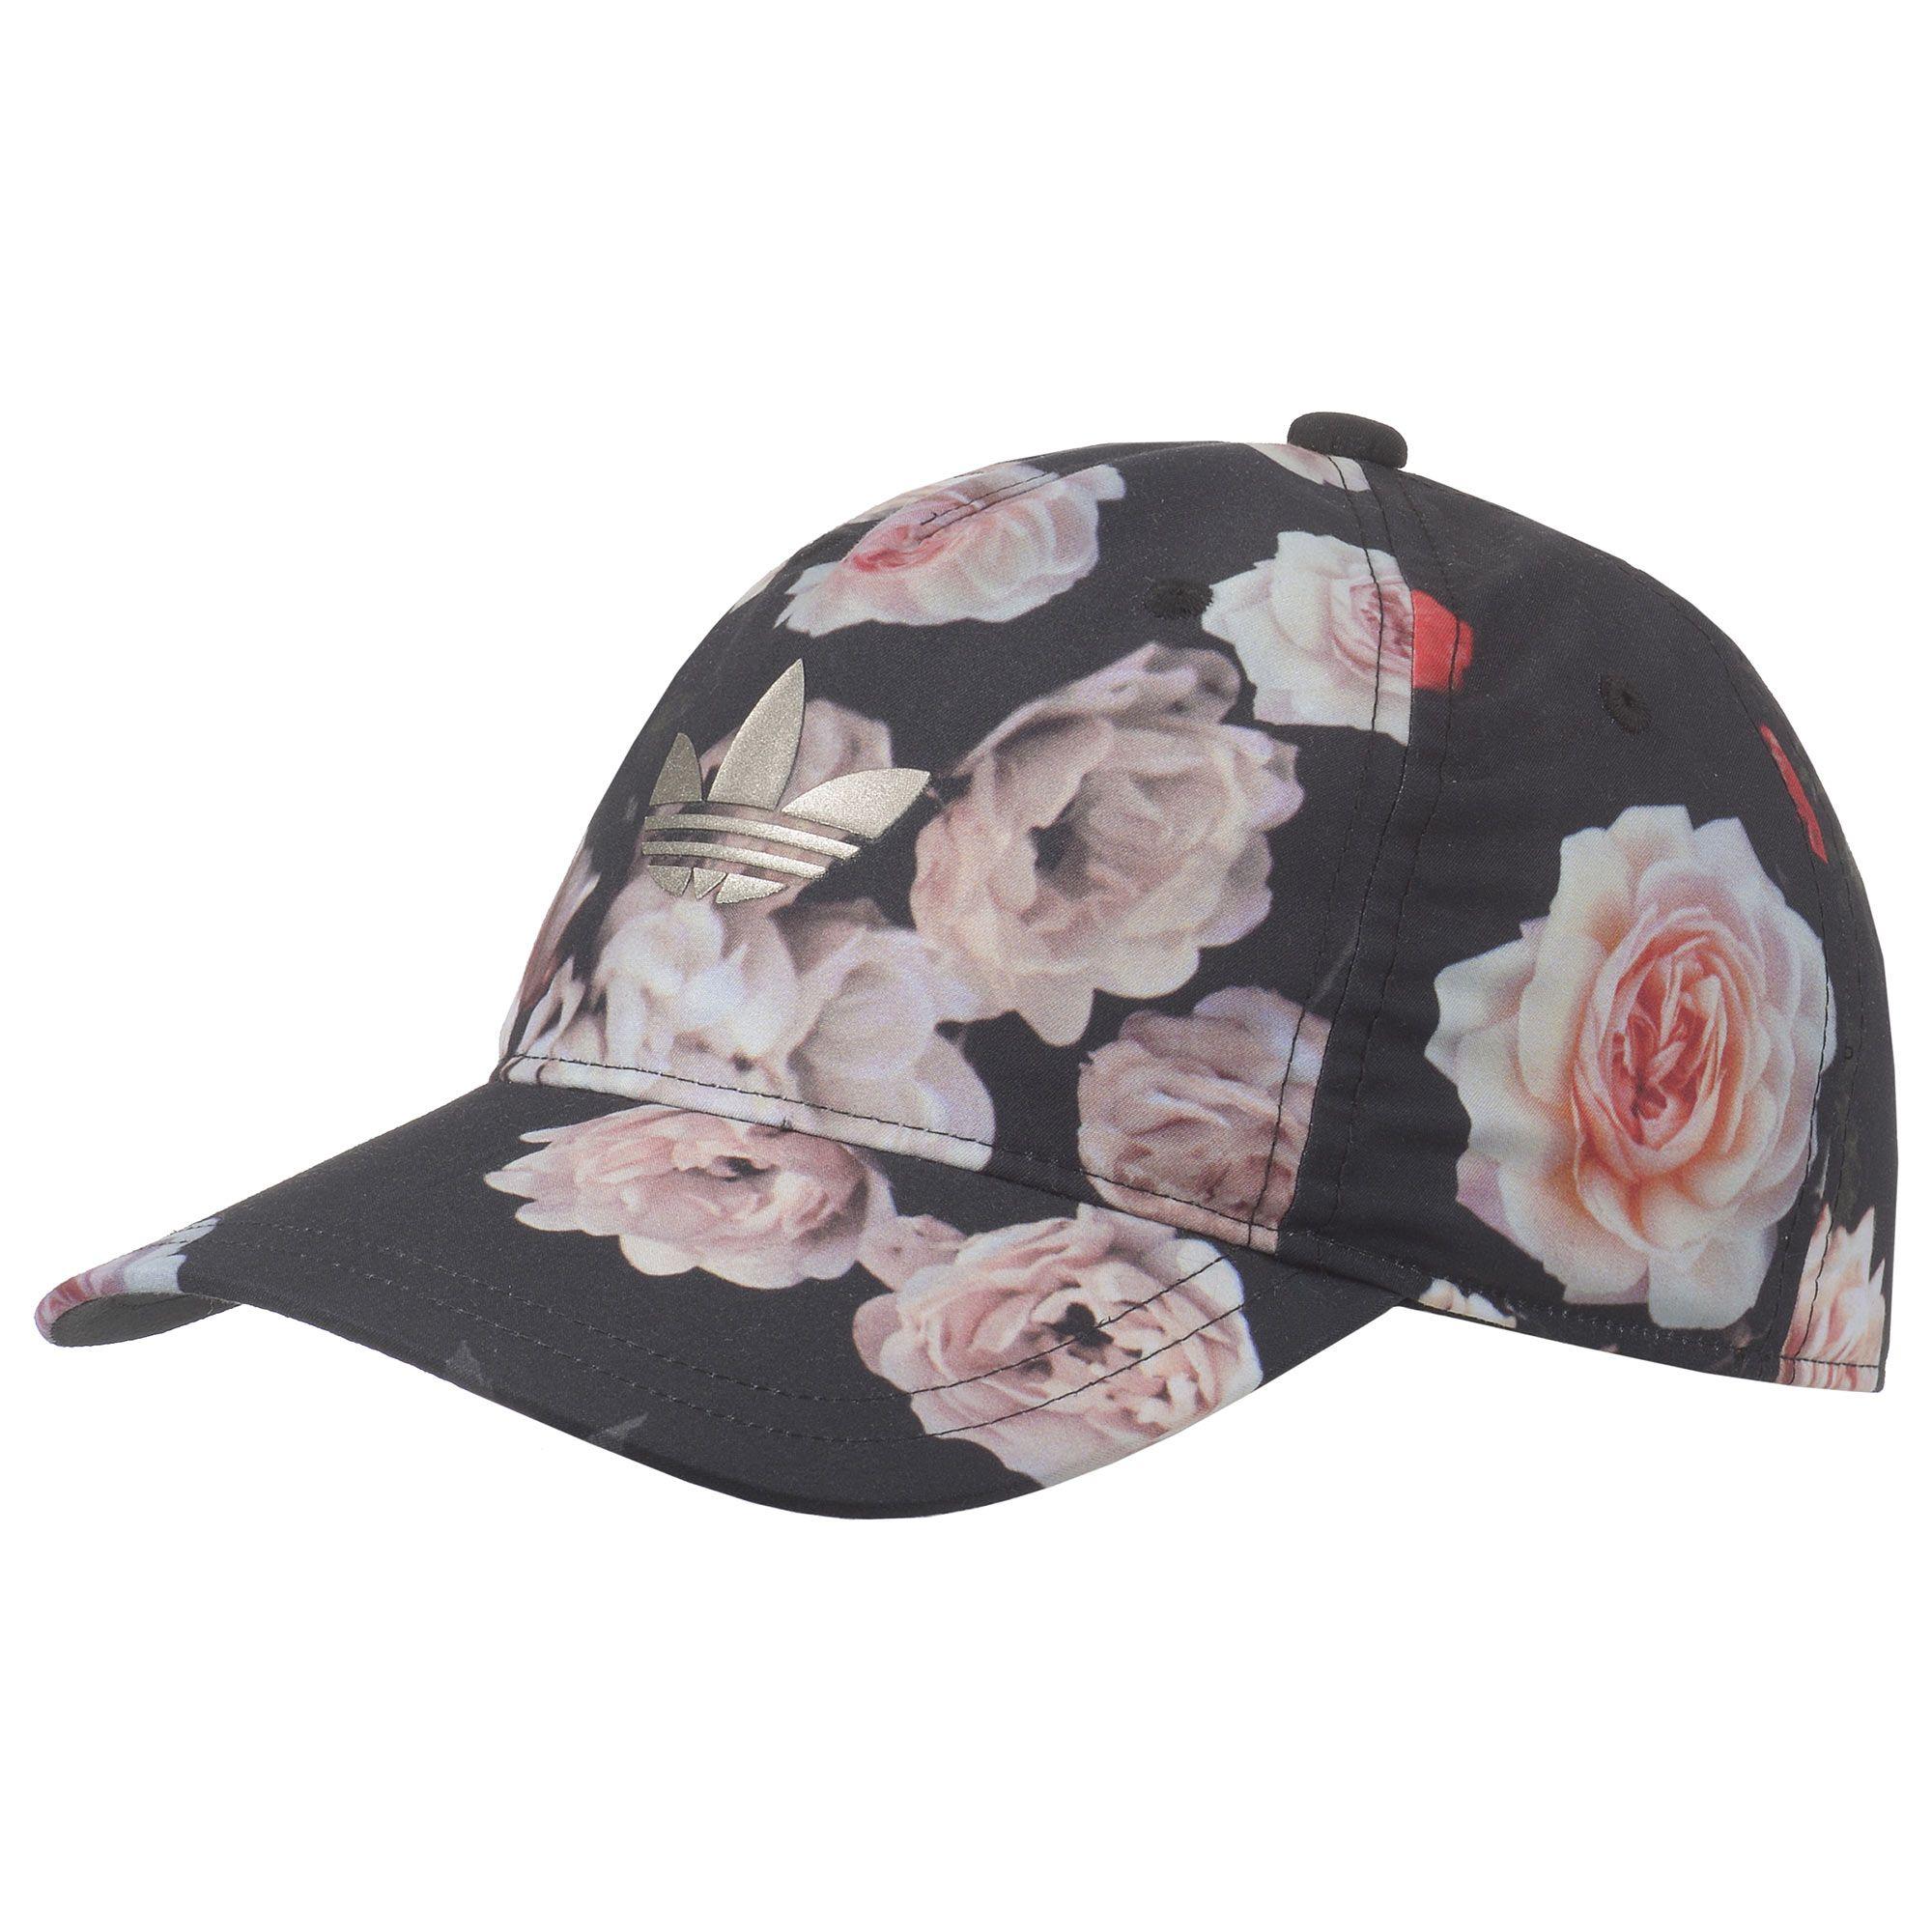 Adidas Originals Rose Hat as seen on Rita Ora